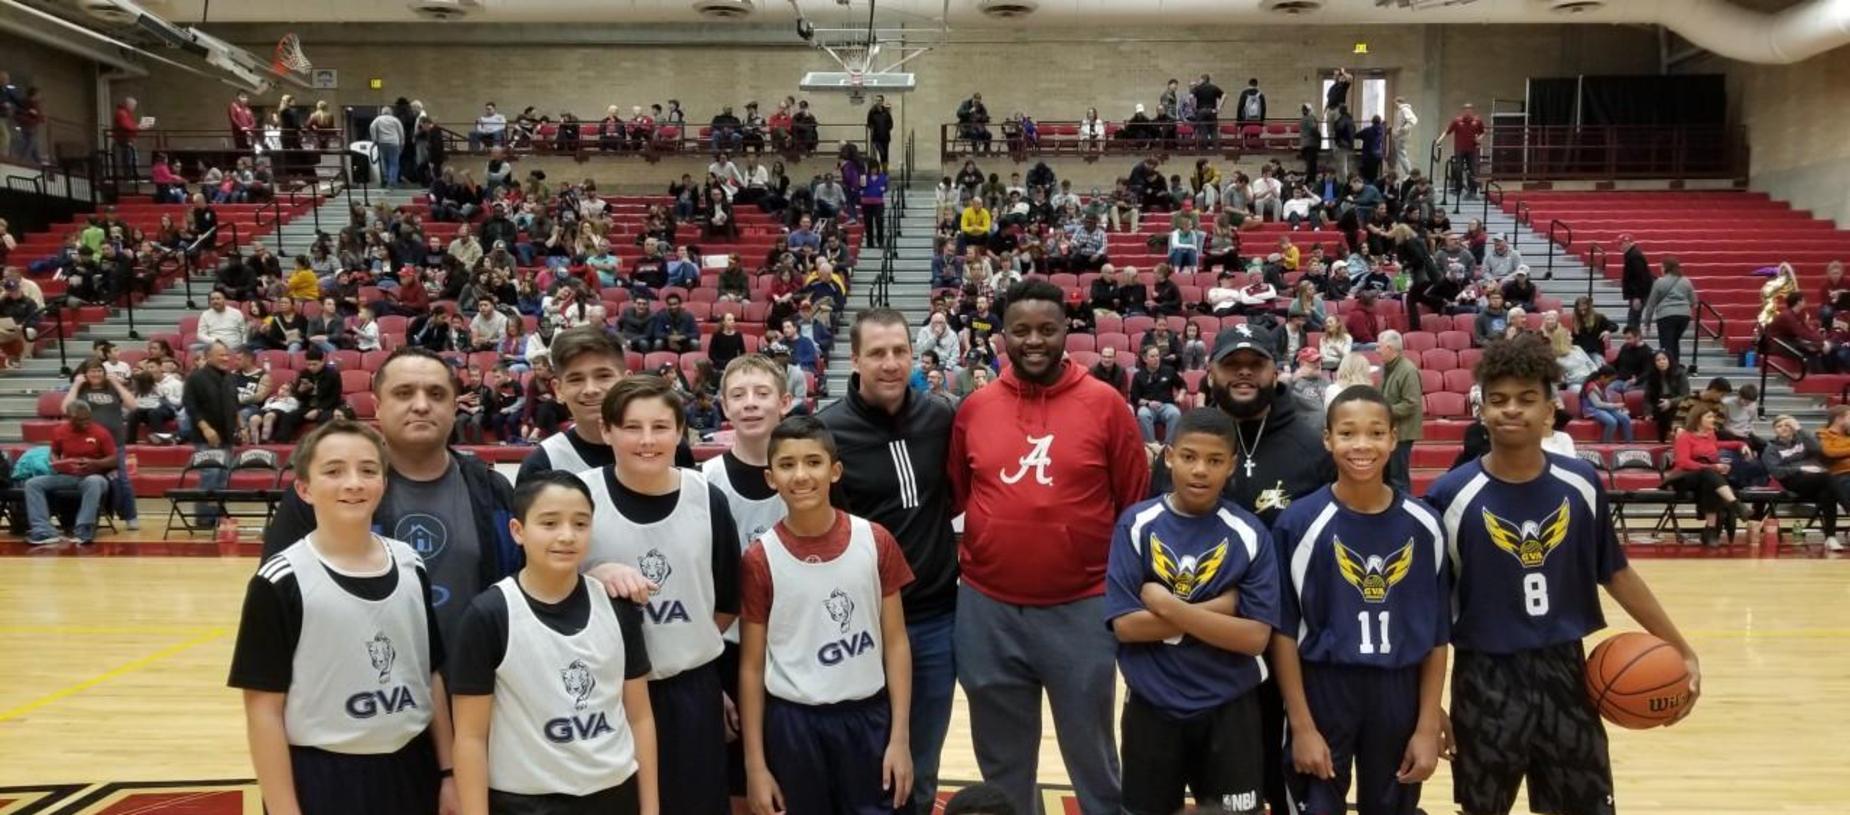 GVA Northglenn and Aurora Boys Basketball Scrimmage at DU